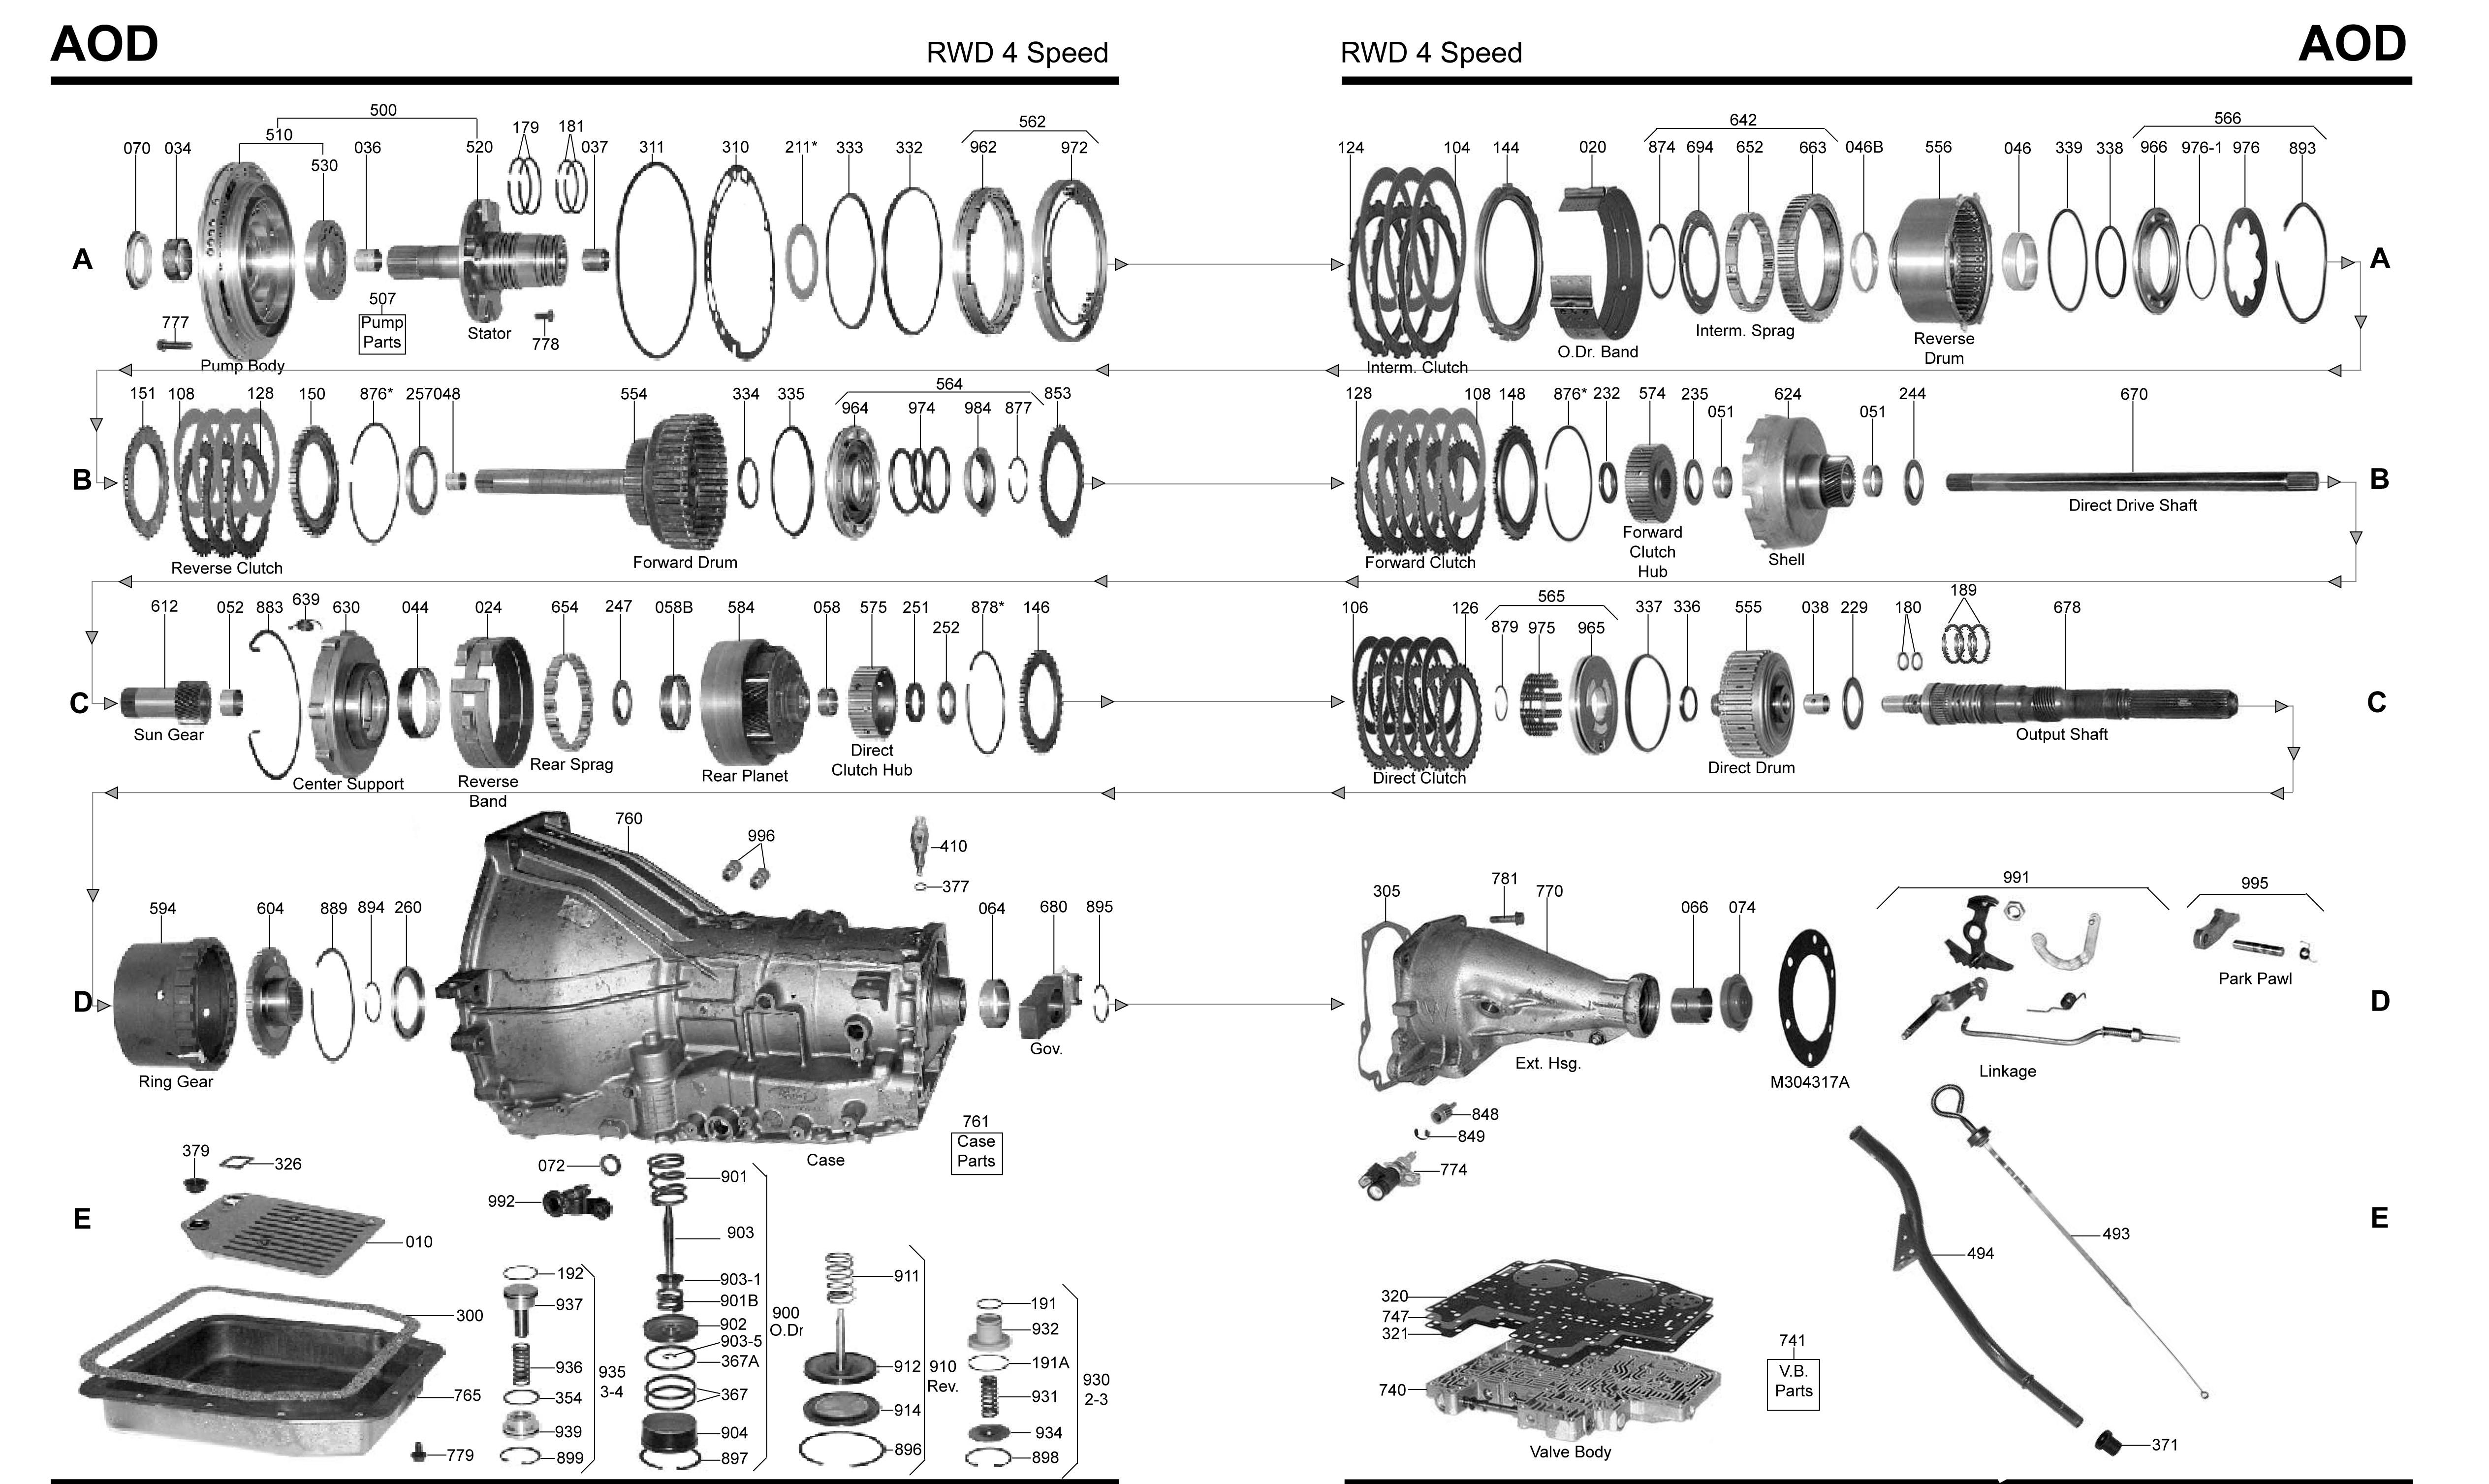 2002 ford Ranger Parts Diagram 4r70w Transmission Diagram Wiring Diagram Of 2002 ford Ranger Parts Diagram